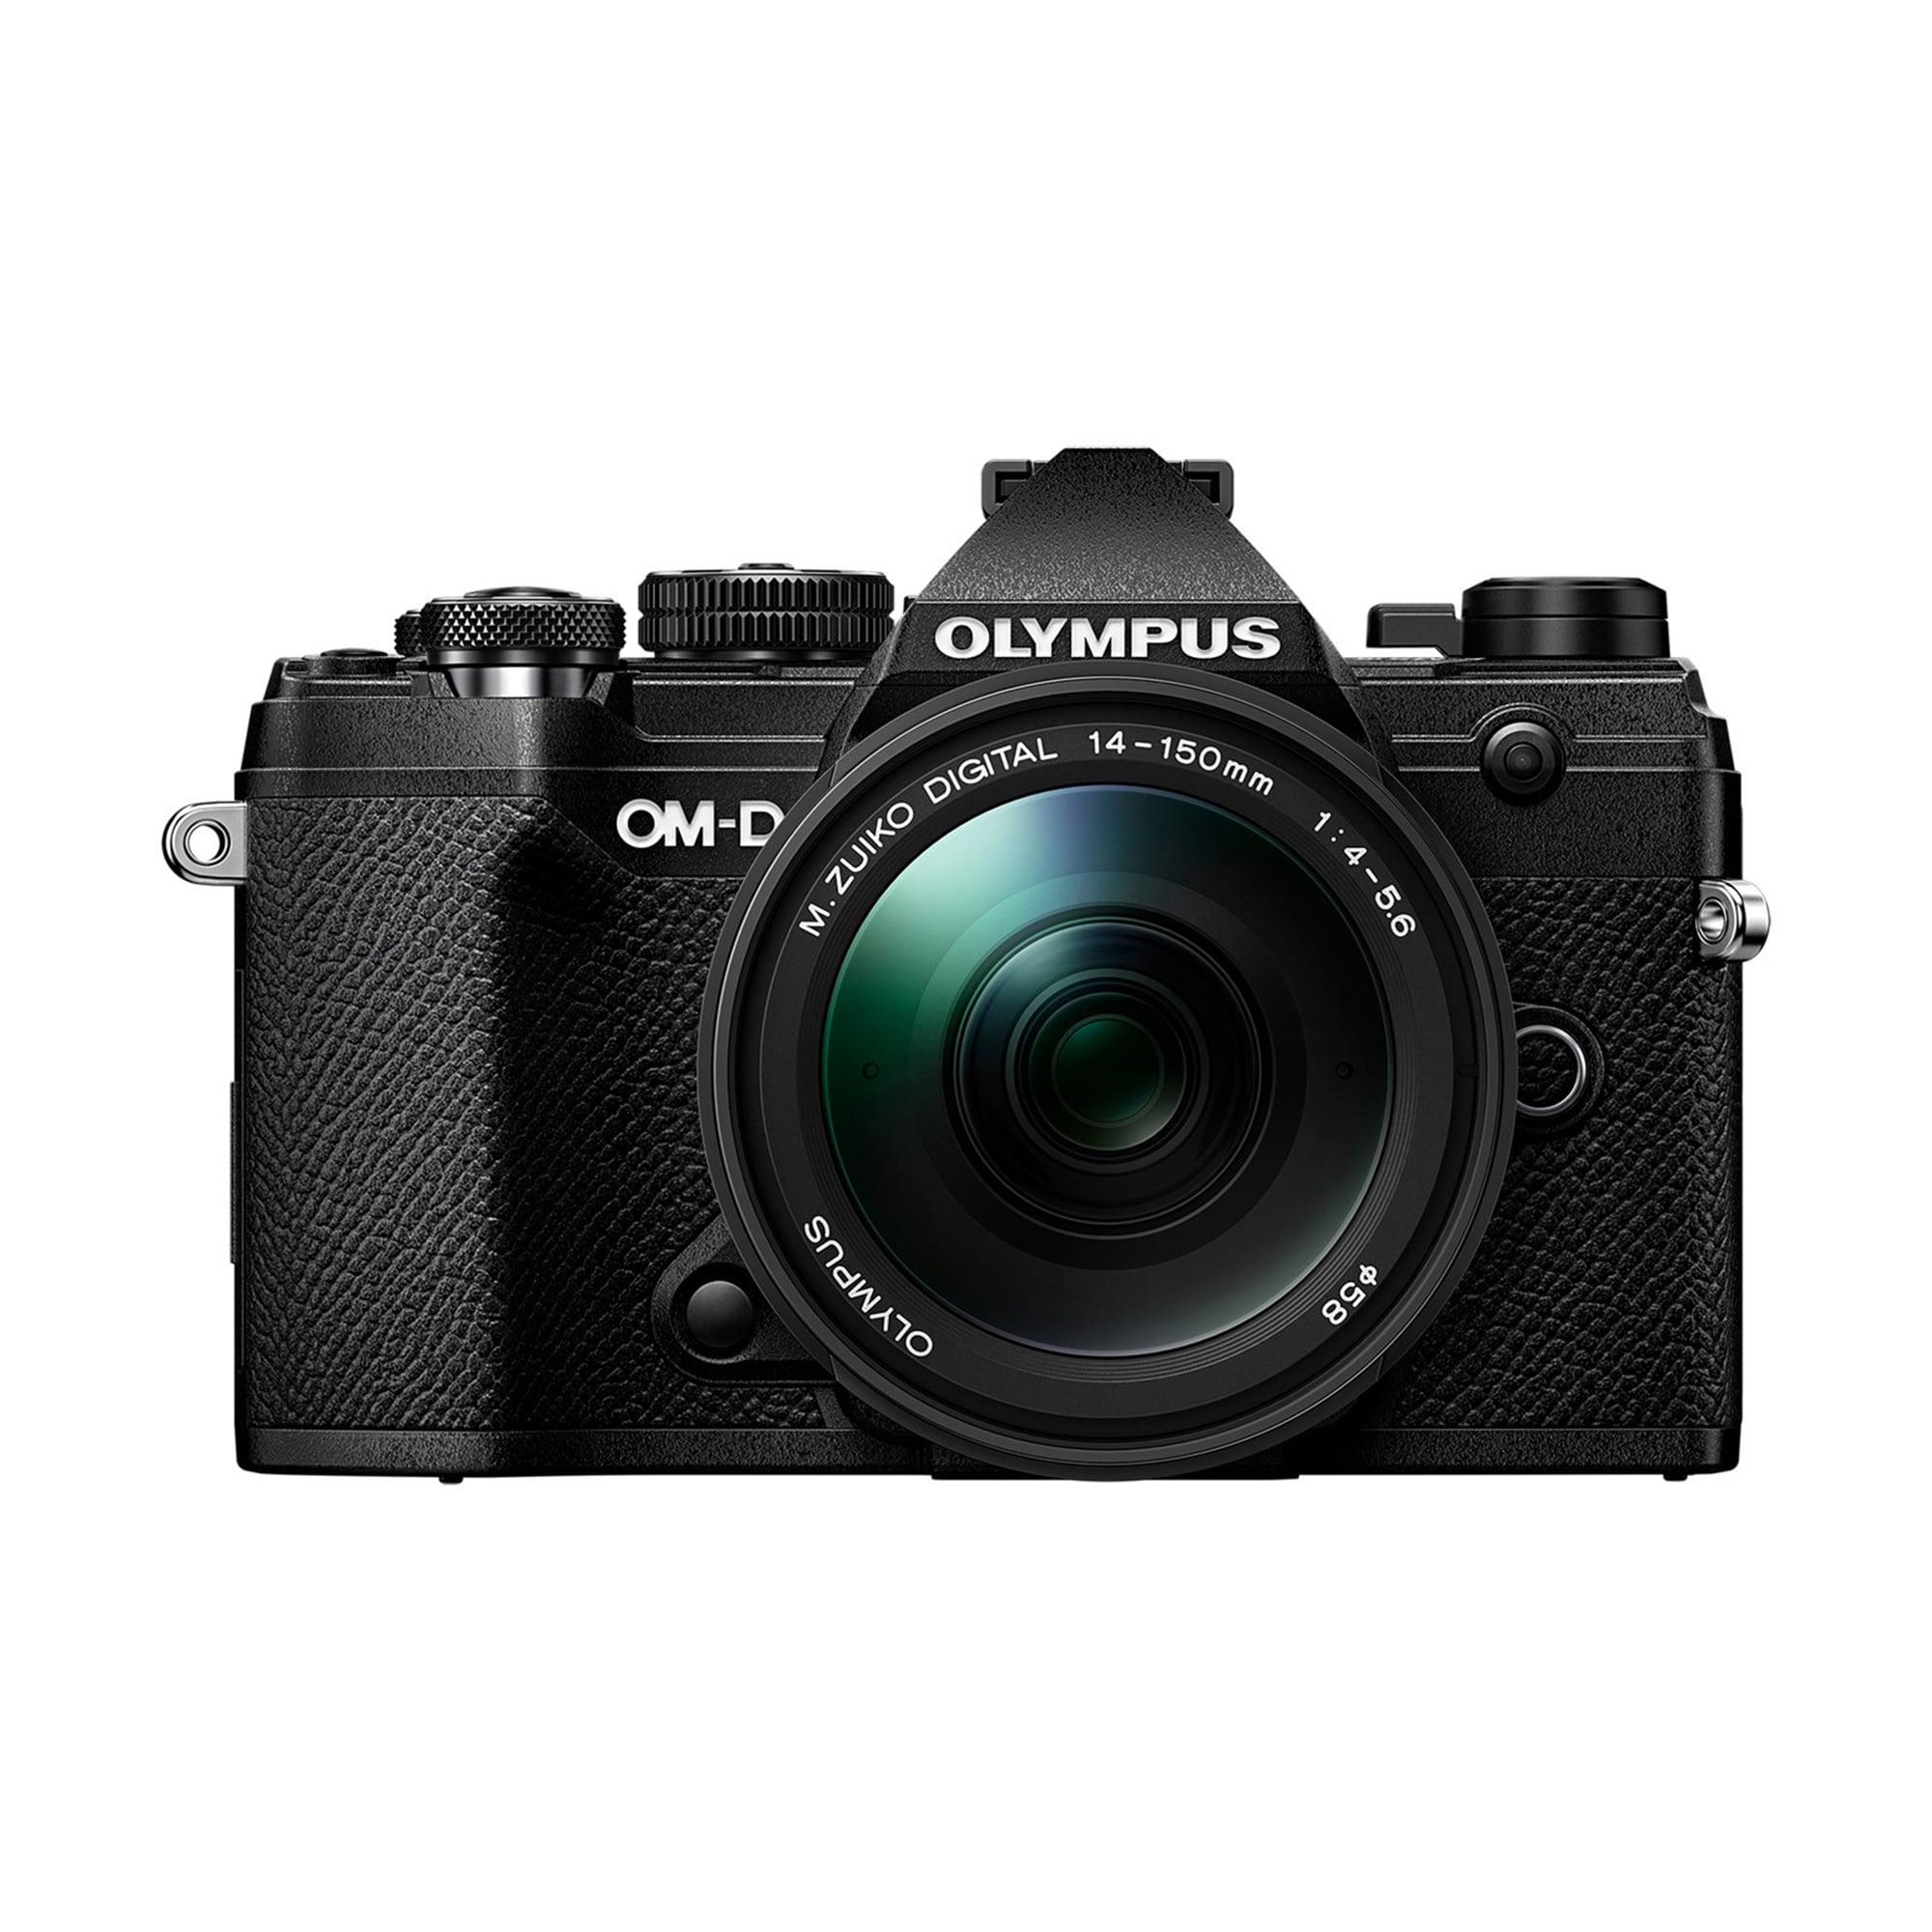 olympus-e-m5-m3-black-front-front-14-150mm-lens